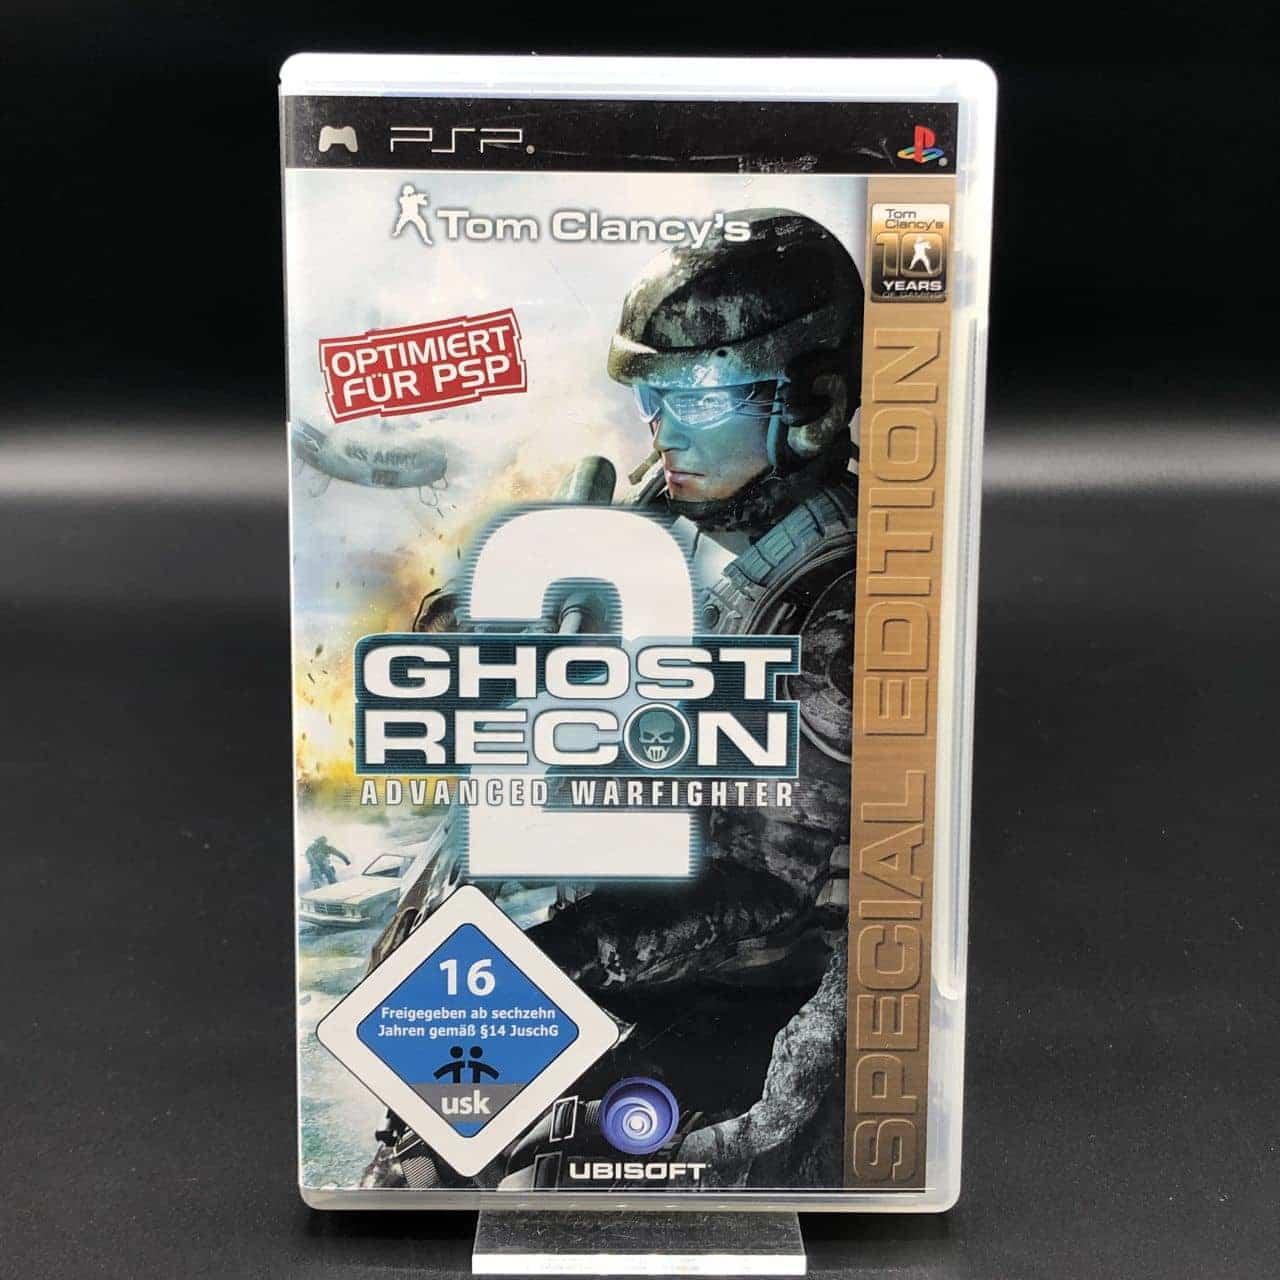 PSP Tom Clancy's Ghost Recon Advanced Warfighter 2 (Special Edition) (Komplett) (Gut)